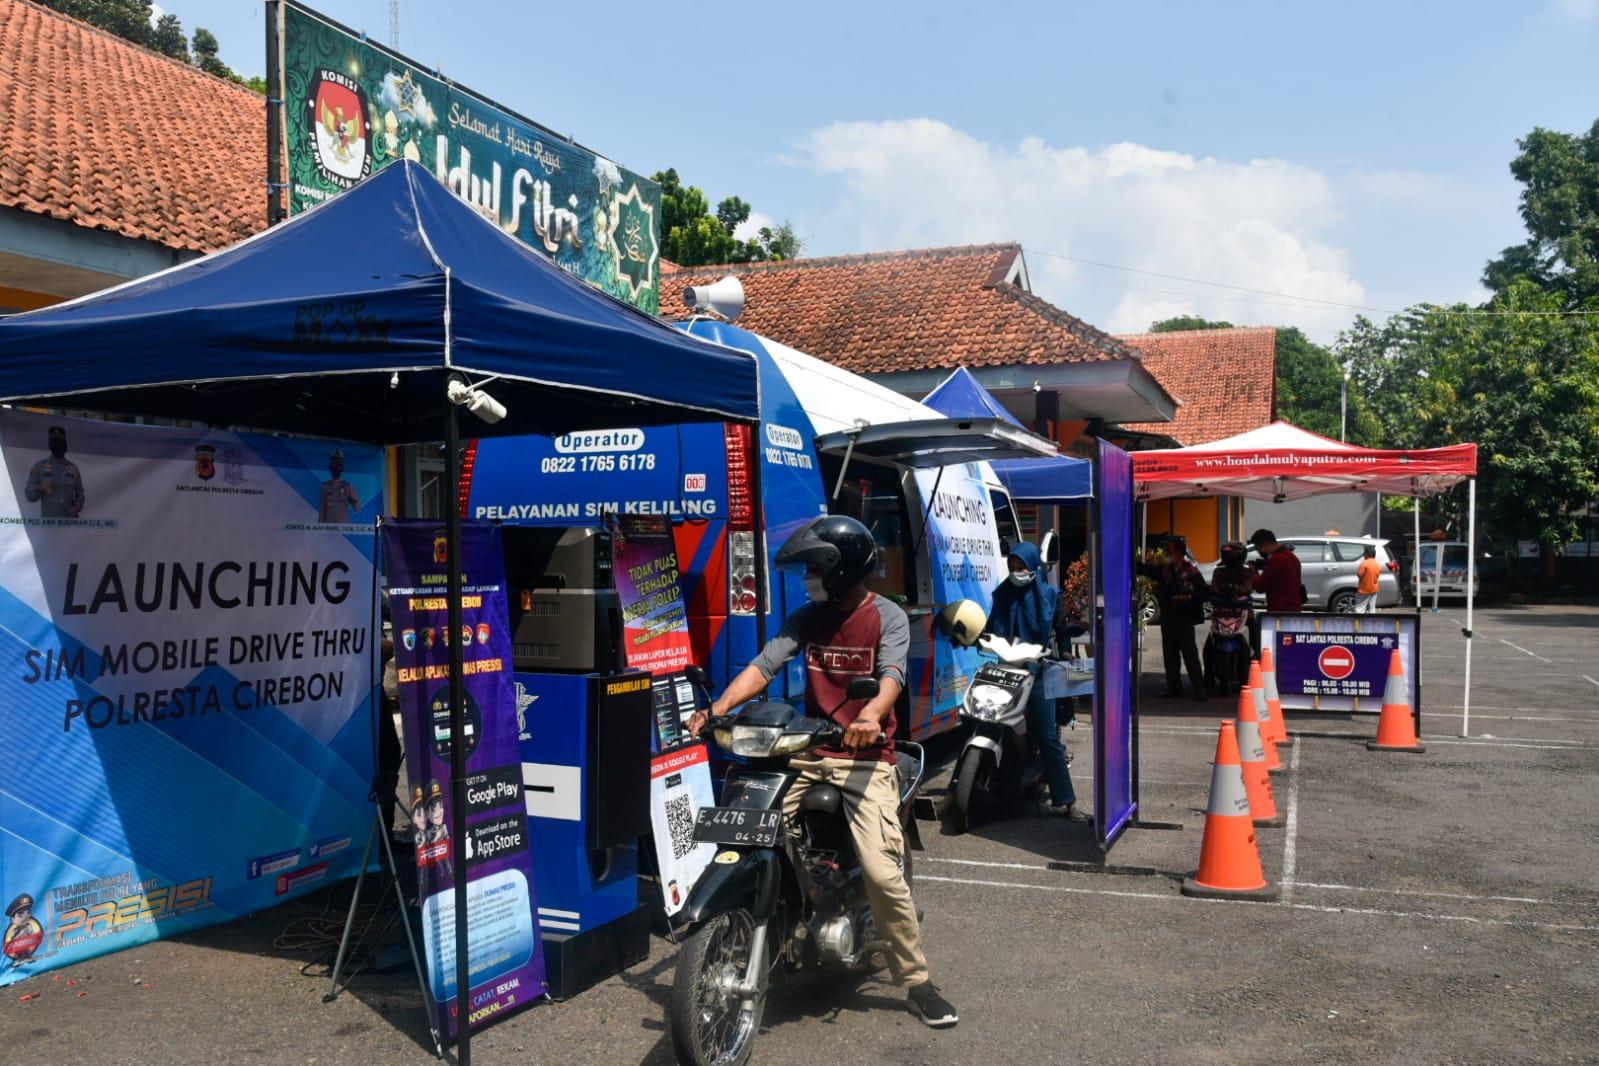 Satlantas Polresta Cirebon Luncurkan Pelayanan SIM Drive Thru